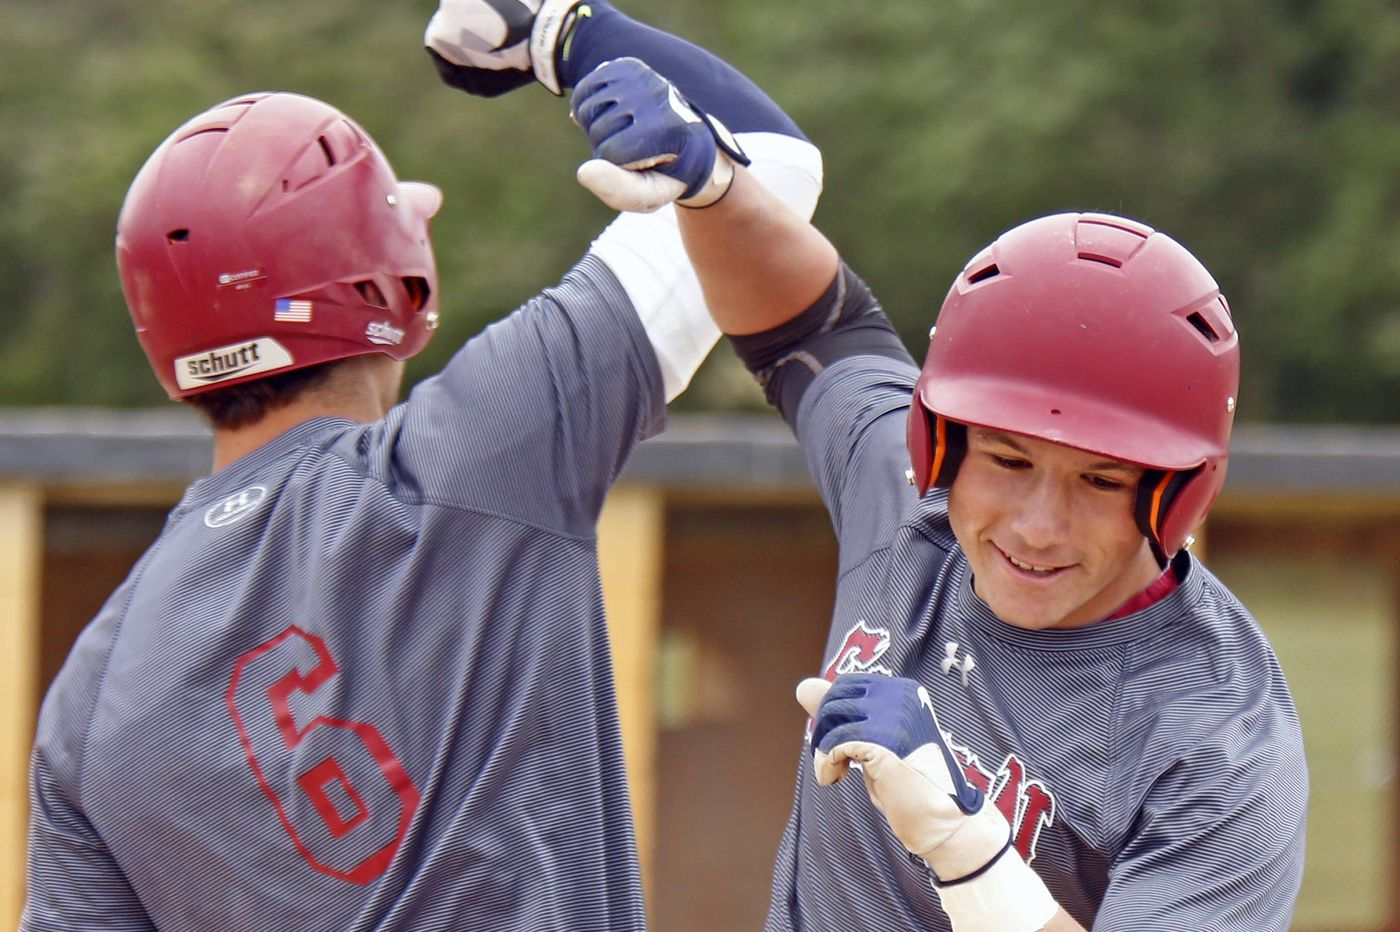 South Jersey baseball: Big changes to Diamond Classic